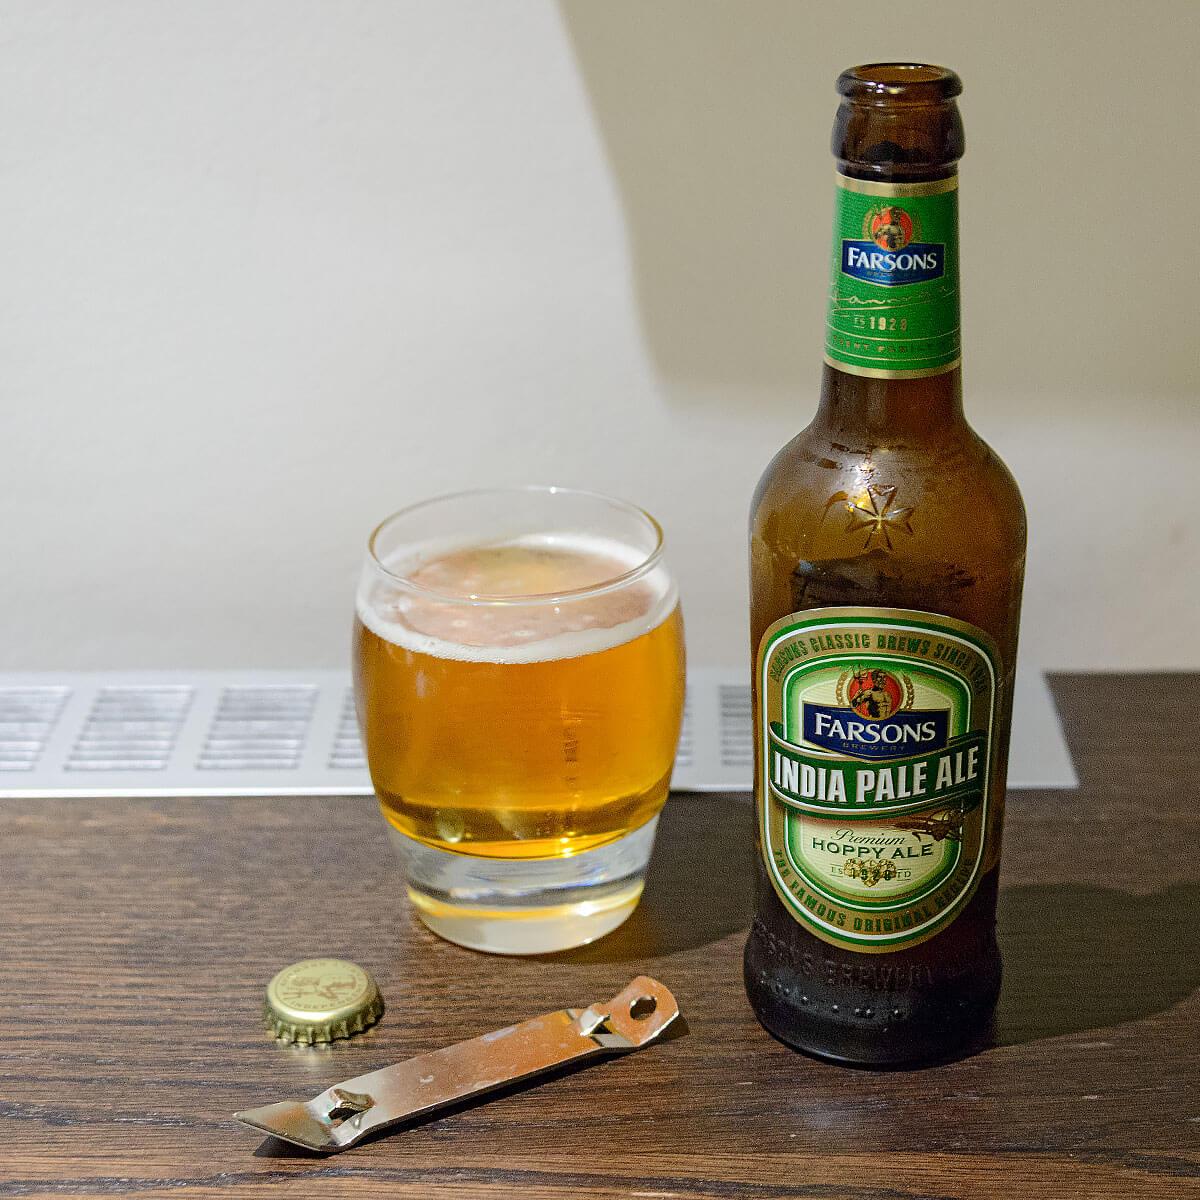 Farsons India Pale Ale, an English-style IPA by Simonds Farsons Cisk Plc.